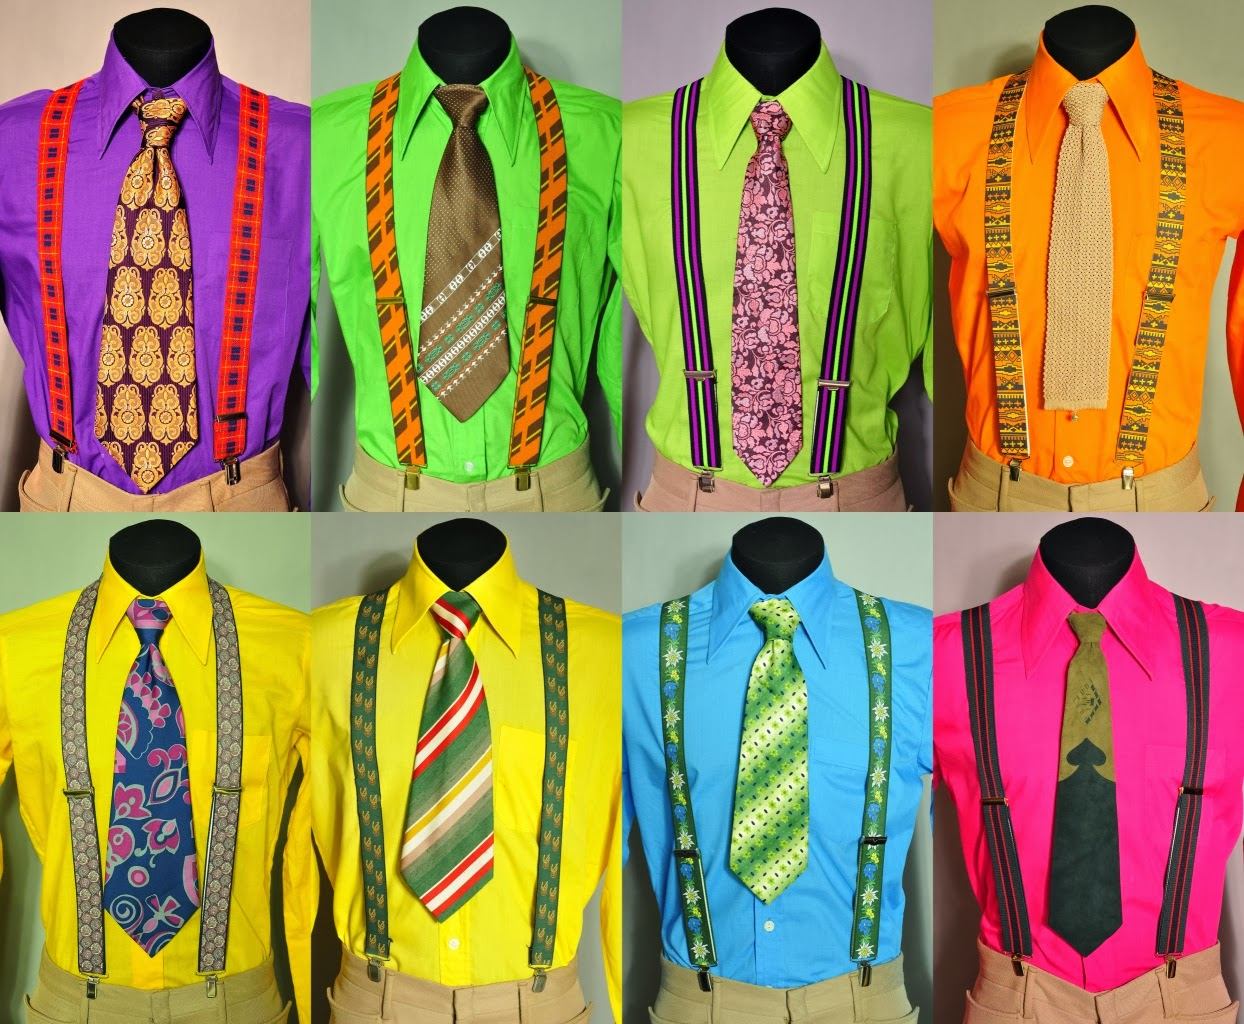 яркие рубашки стиляг